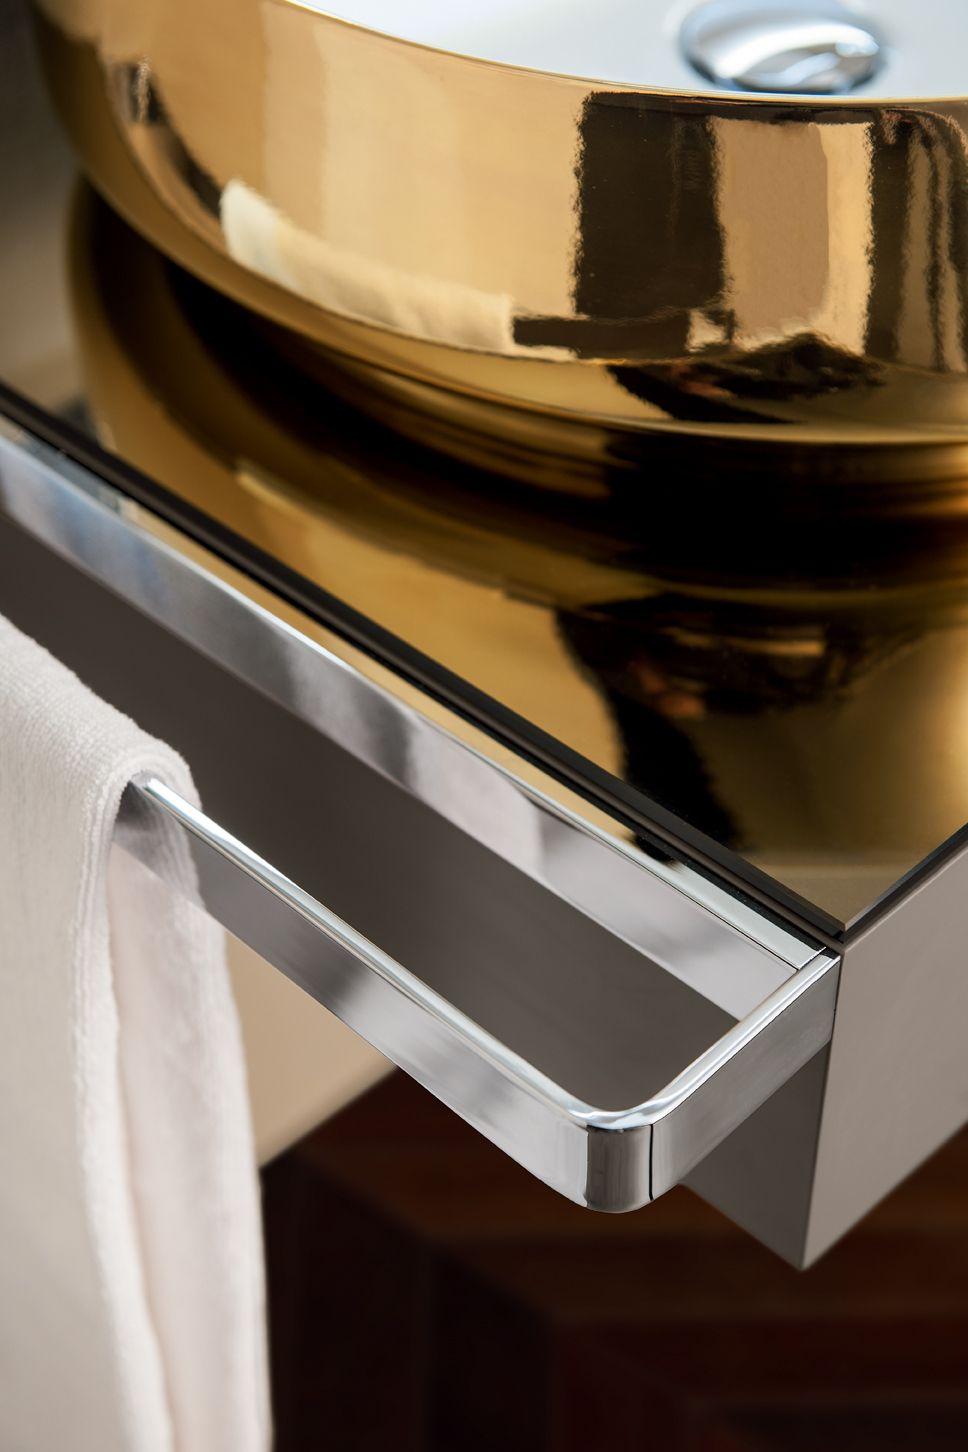 Sectional vanity unit qamar composizione 2 qamar collection by inda design sergio brioschi - Inda bagno catalogo ...